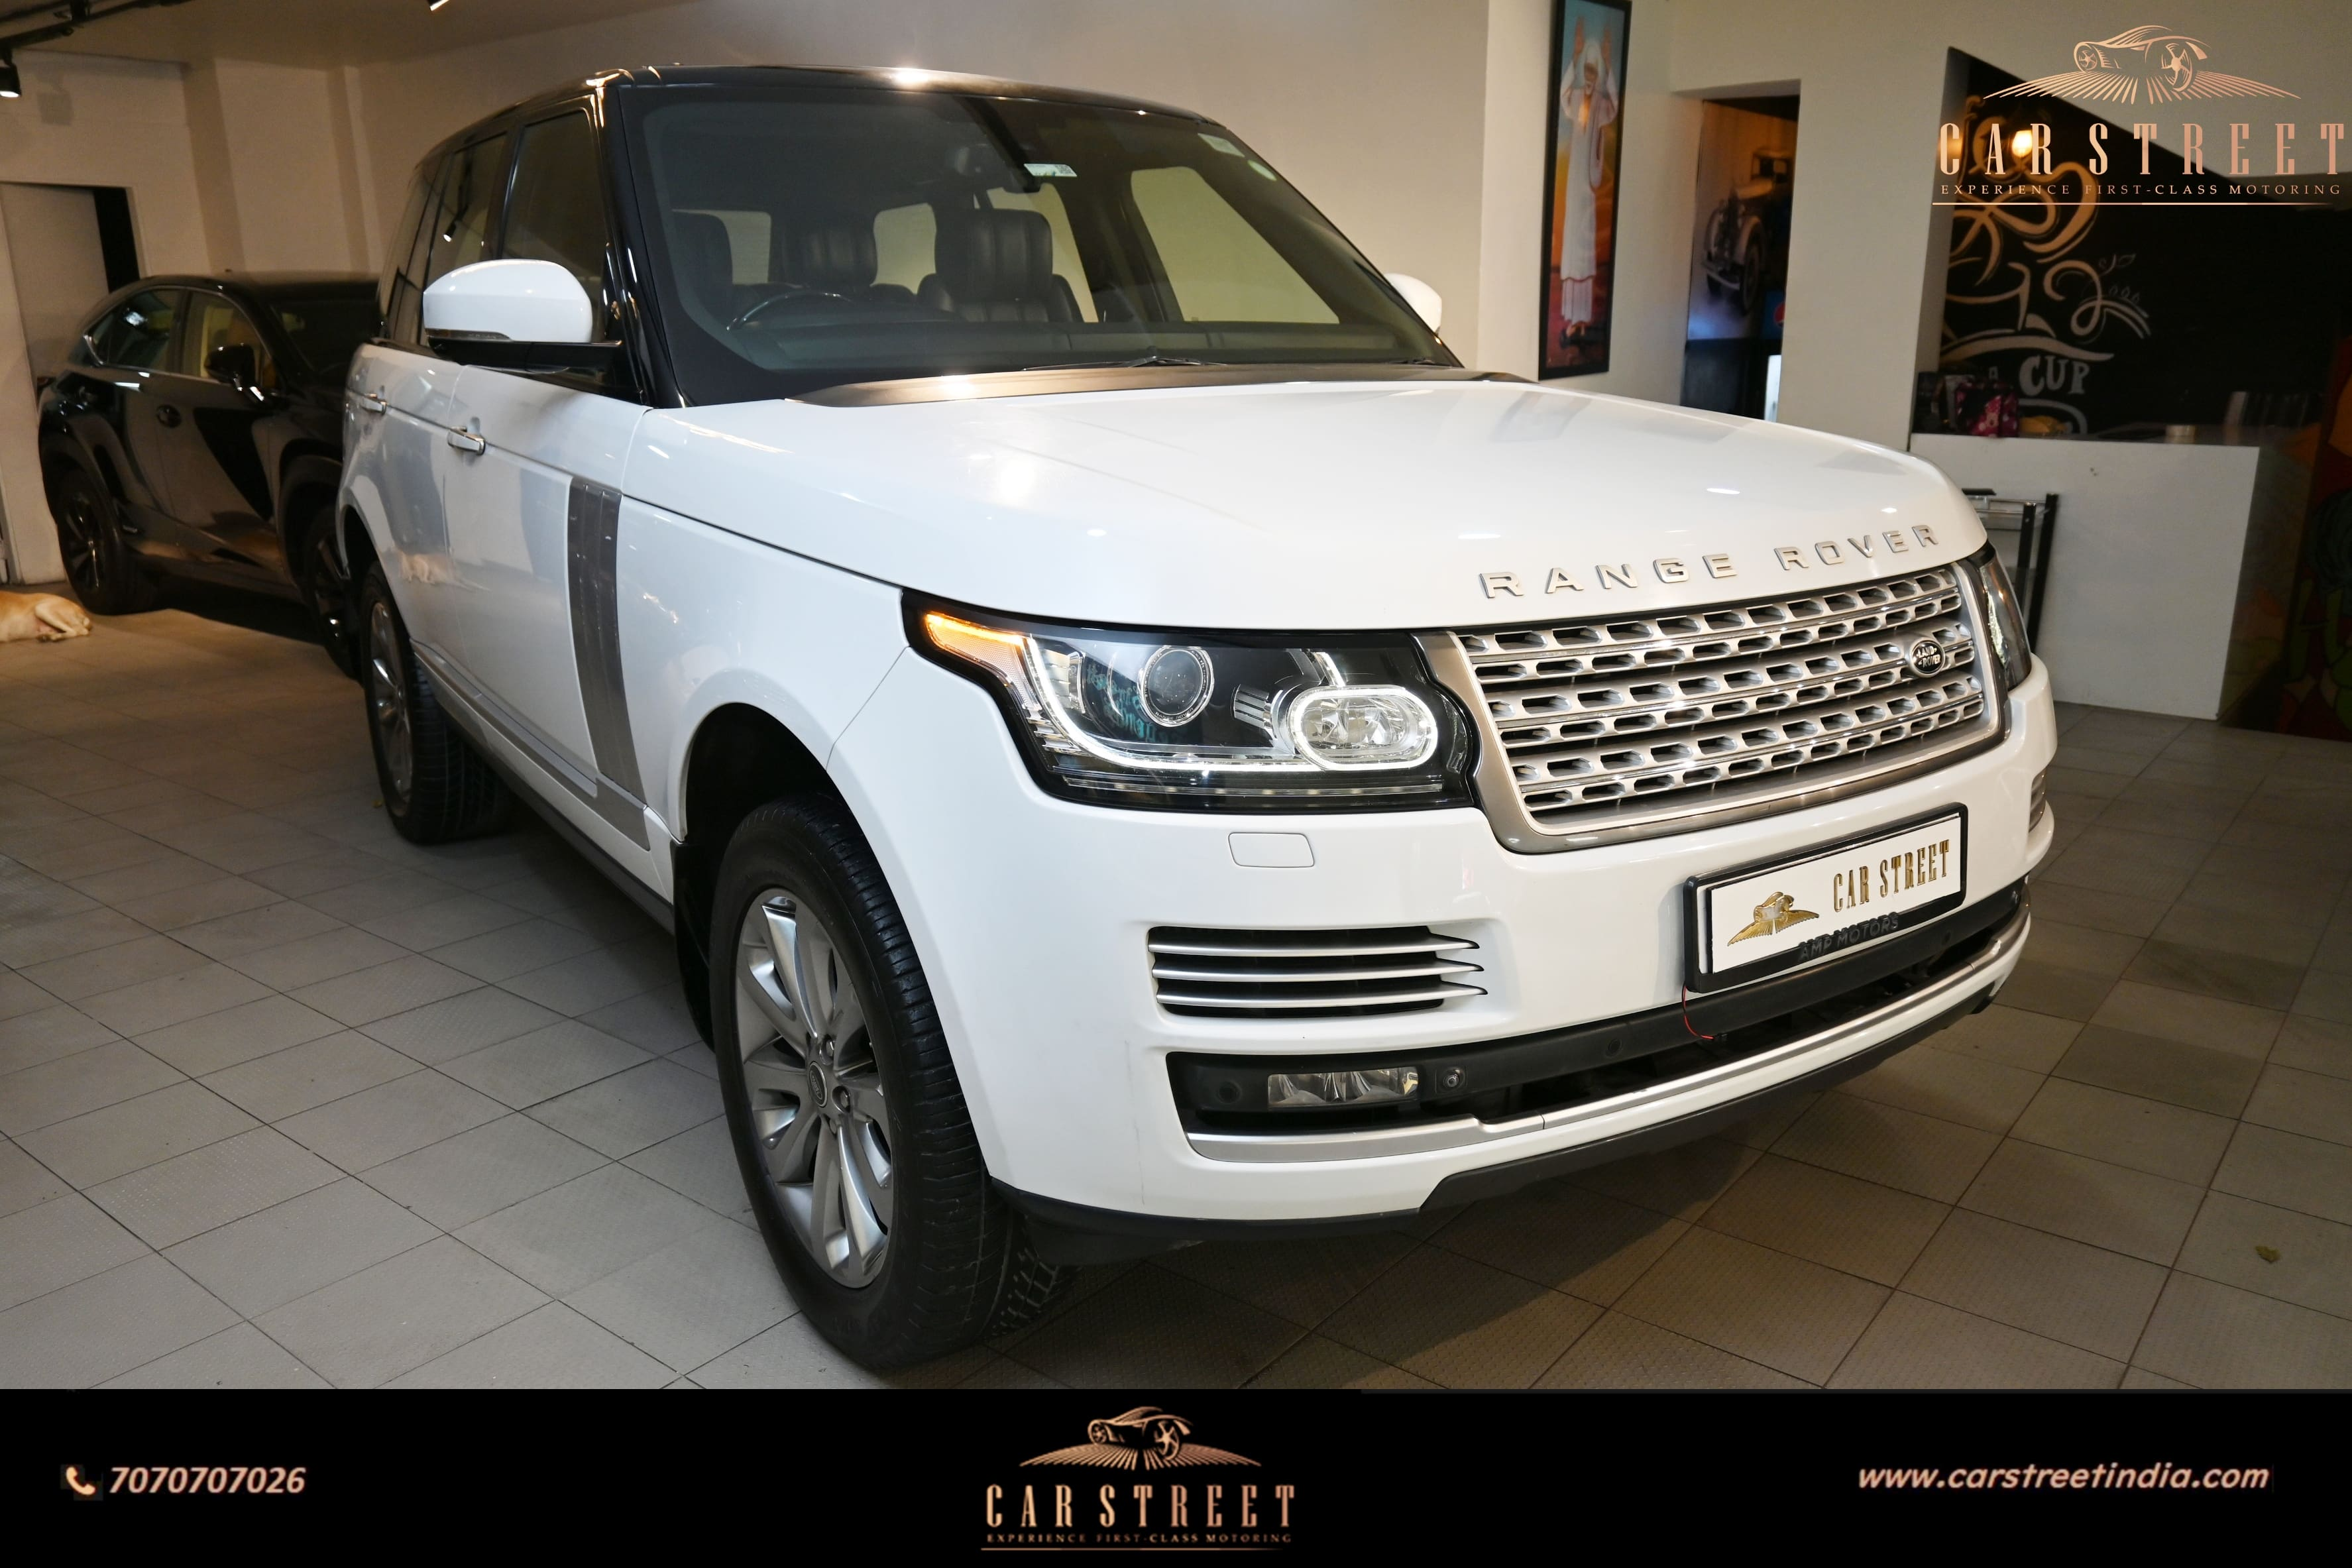 Land Rover Range Rover 2013-2014 Autobiography 4.4 SDV8